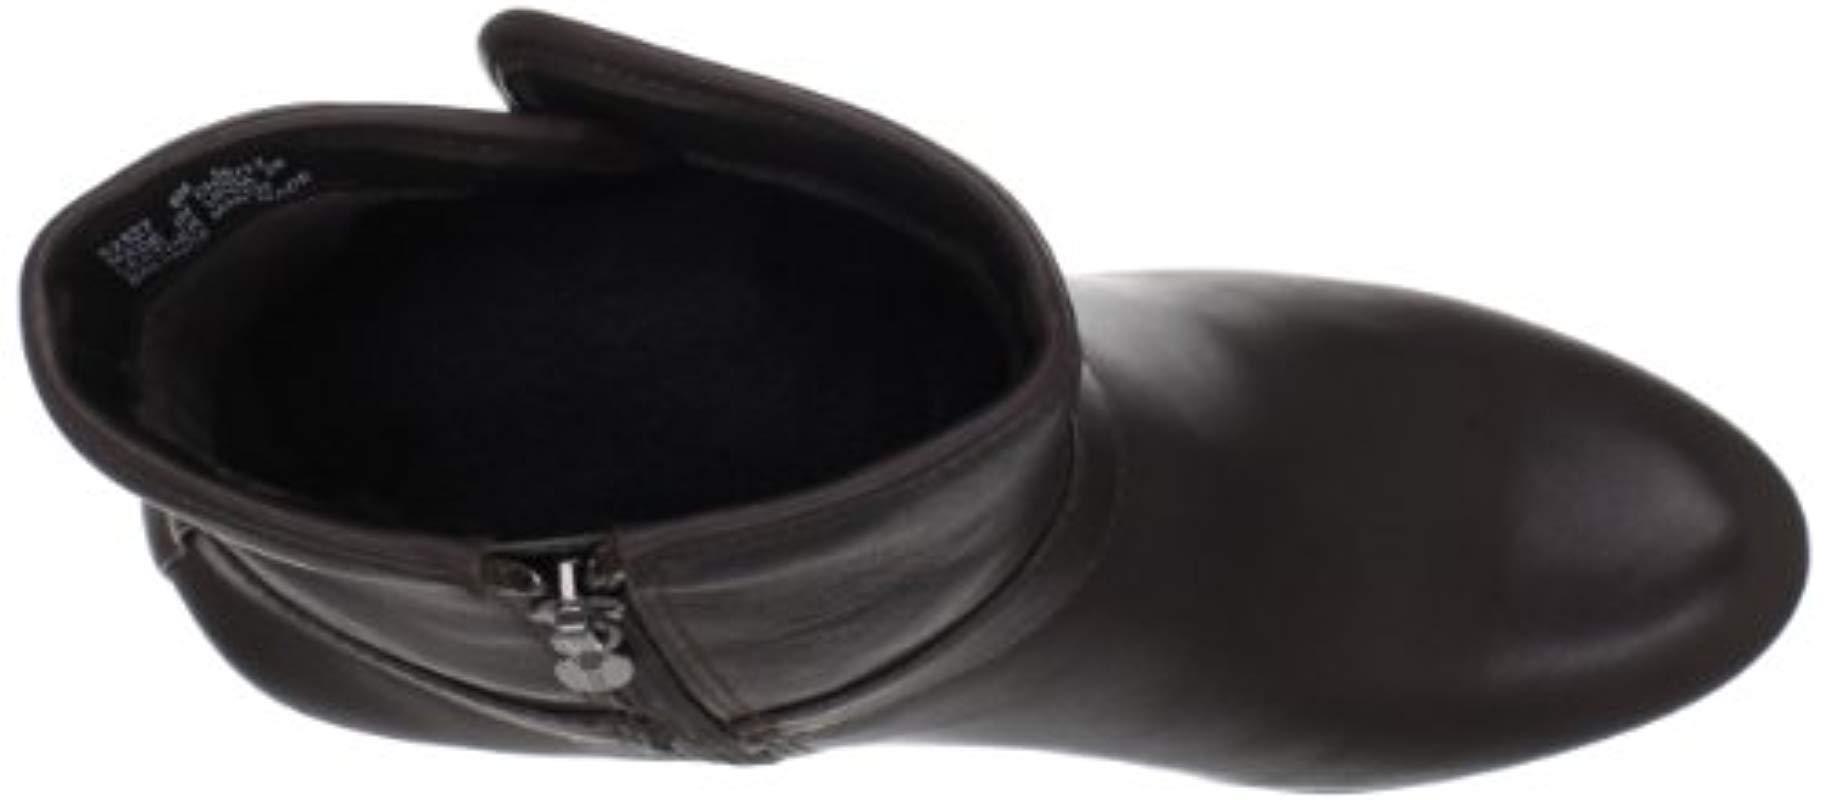 Clarks Leather Study Grade in Dark Brown (Brown)